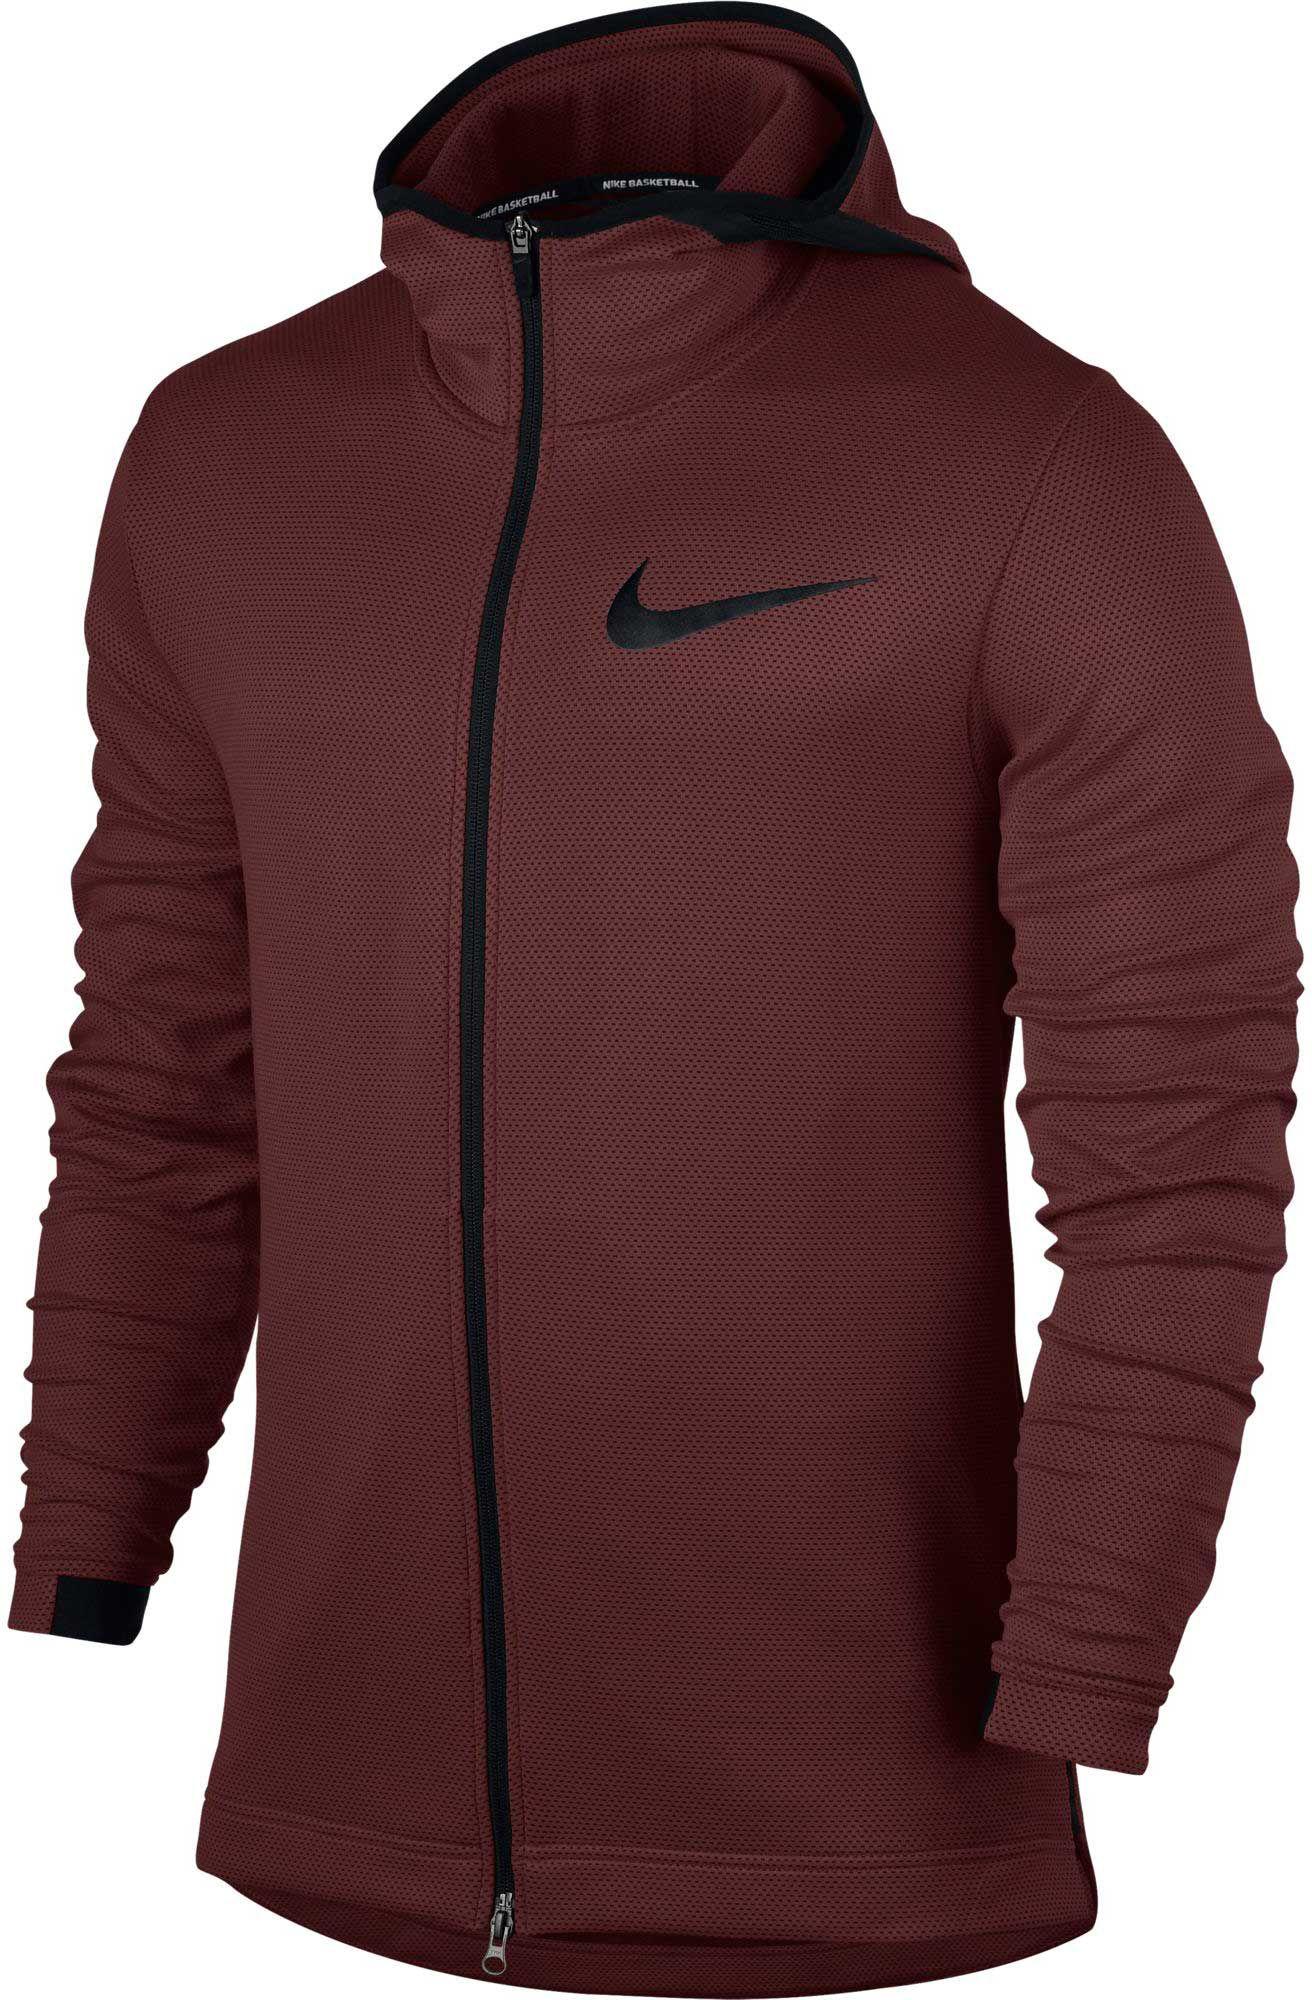 Nike Men's Therma Flex Showtime Full Zip Basketball Hoodie. 0:00. 0:00 /  0:00. noImageFound ???